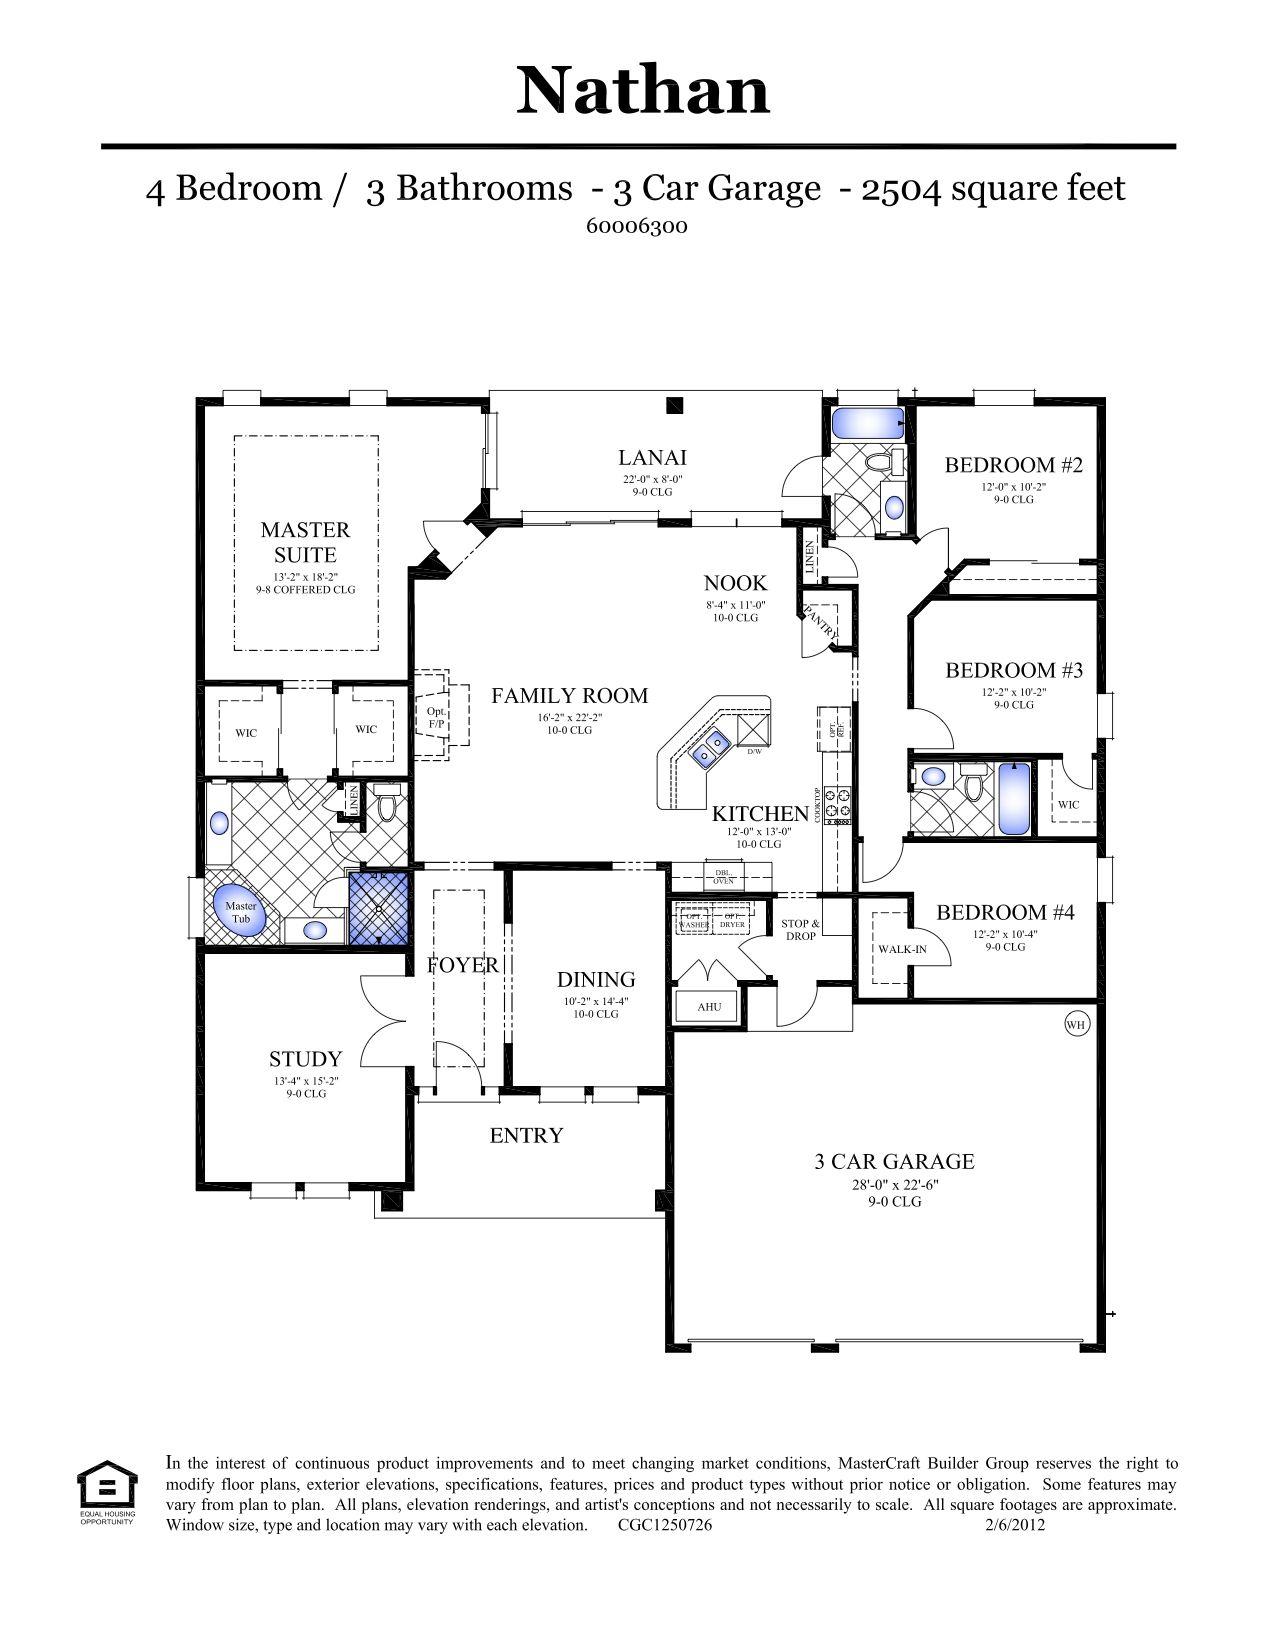 riley home plan, ashby home plan, breckenridge home plan, on worthington home plan